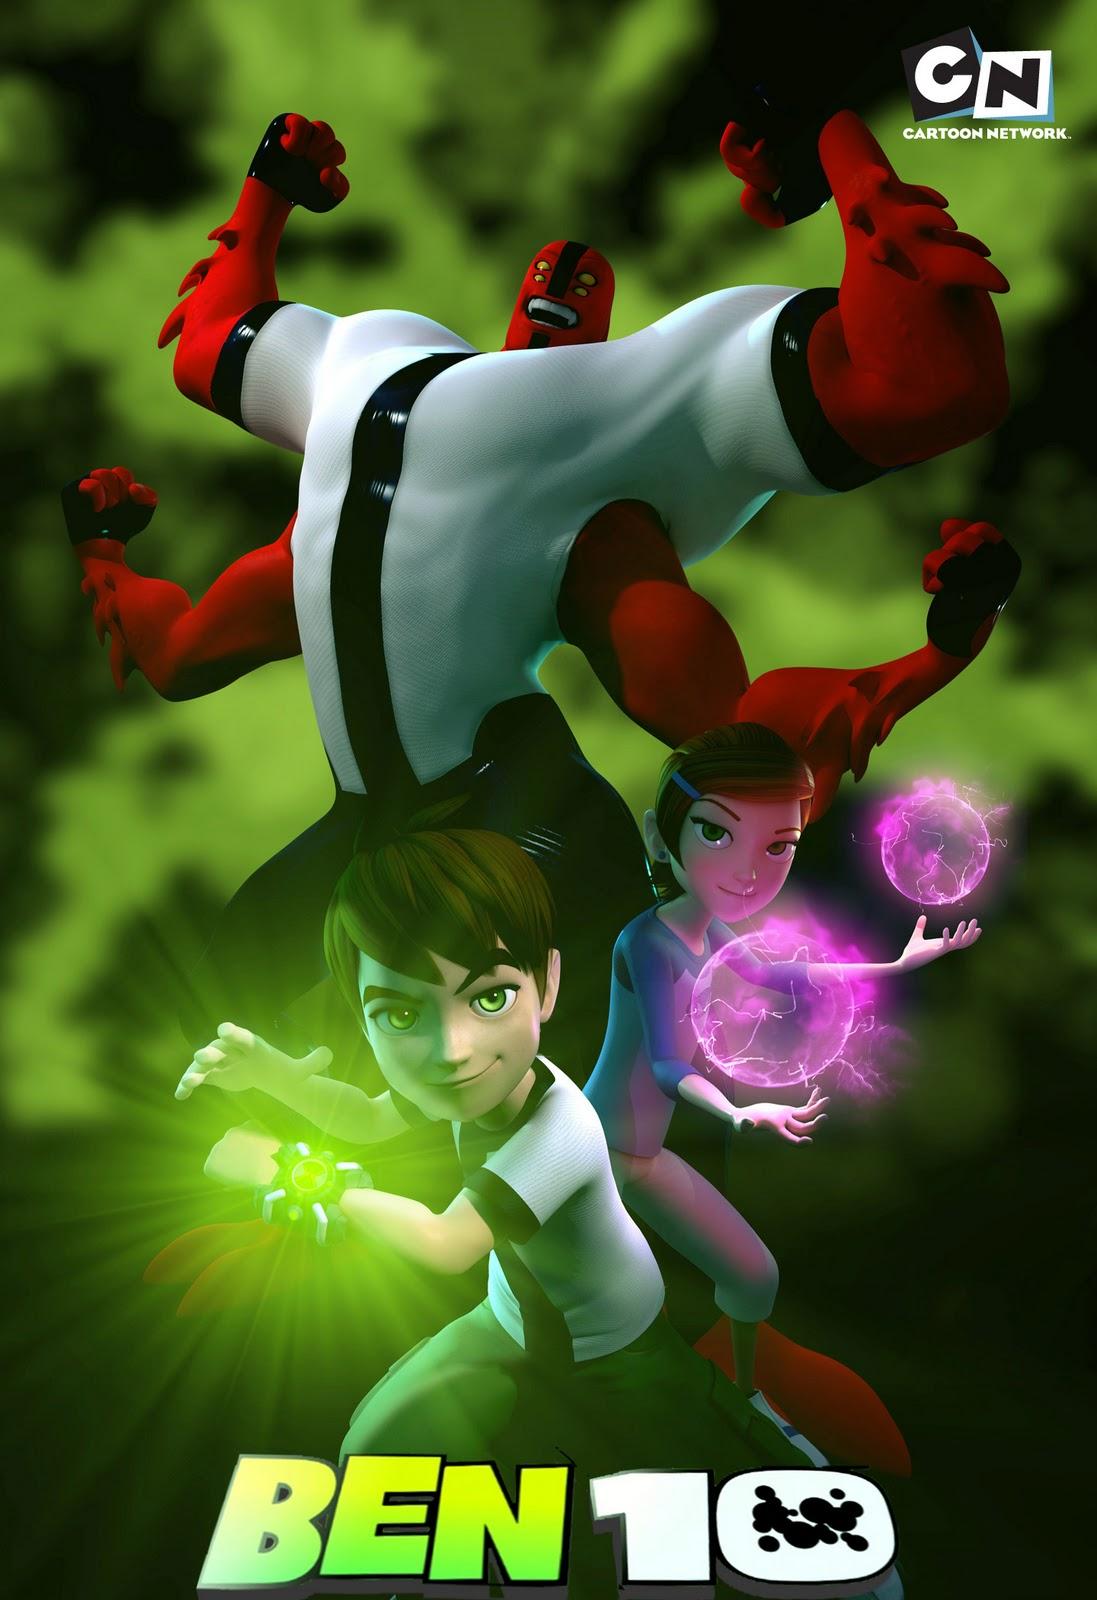 movie pictures ben 10 cartoon anime